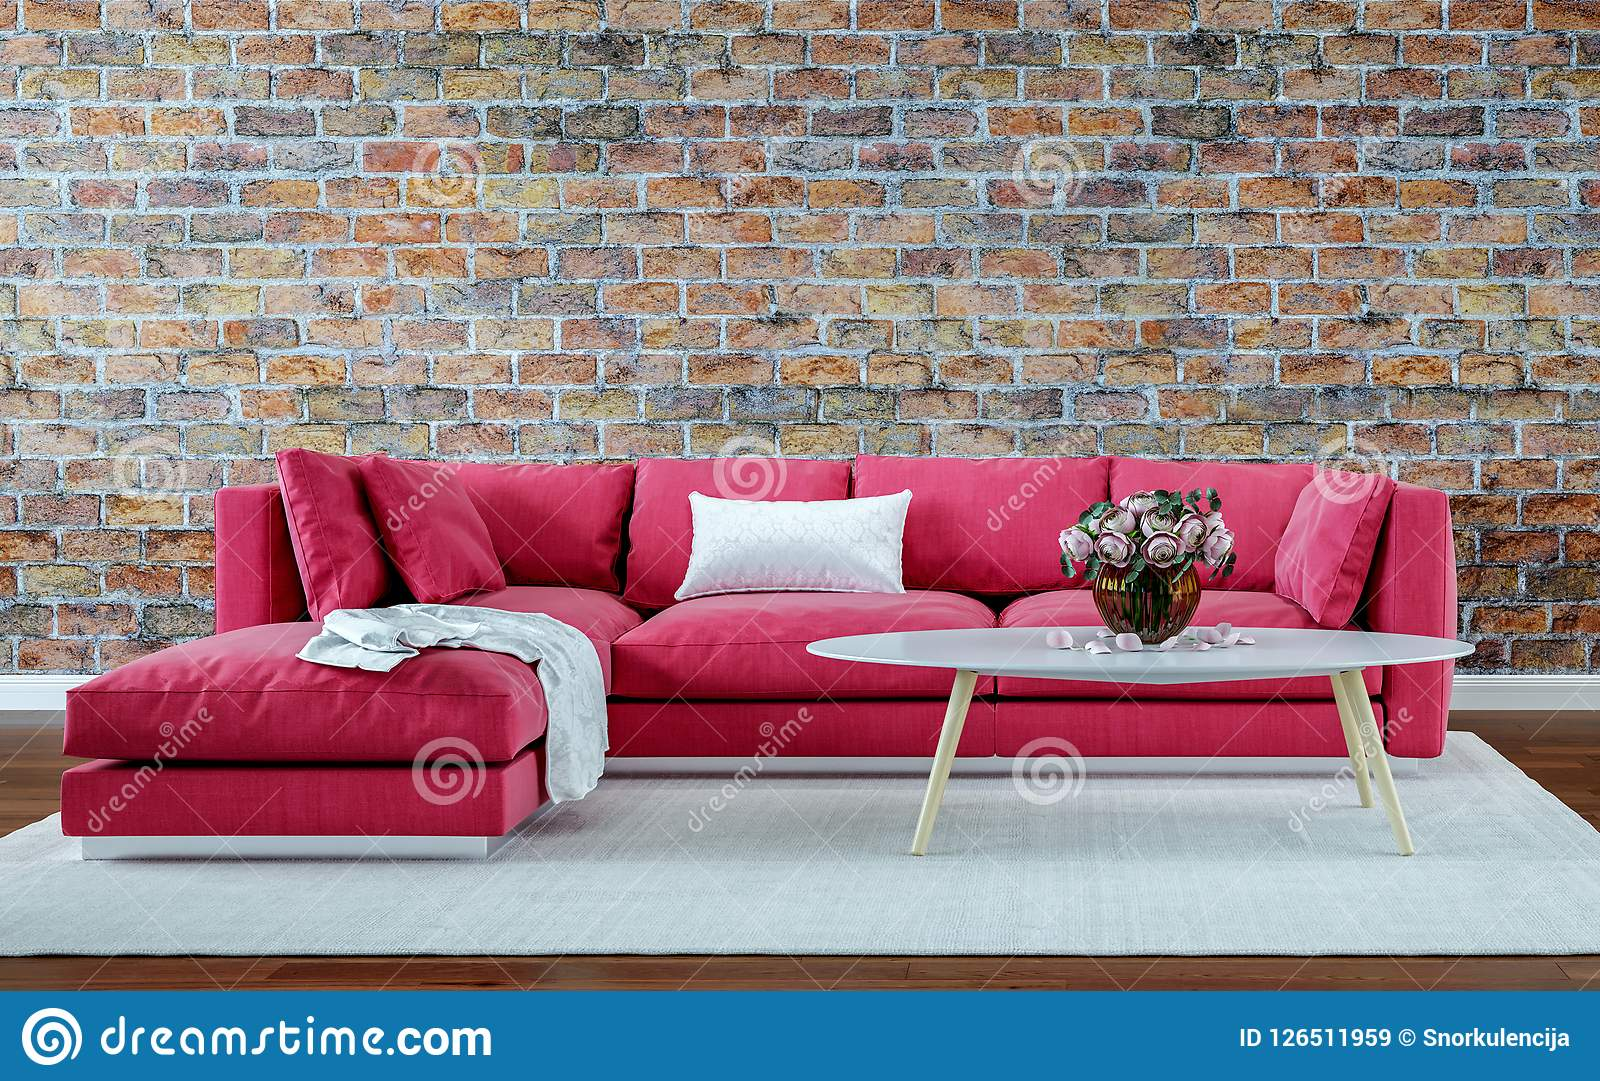 Miraculous Modern Interior Design Living Room Old Brick Wall Retro Inzonedesignstudio Interior Chair Design Inzonedesignstudiocom